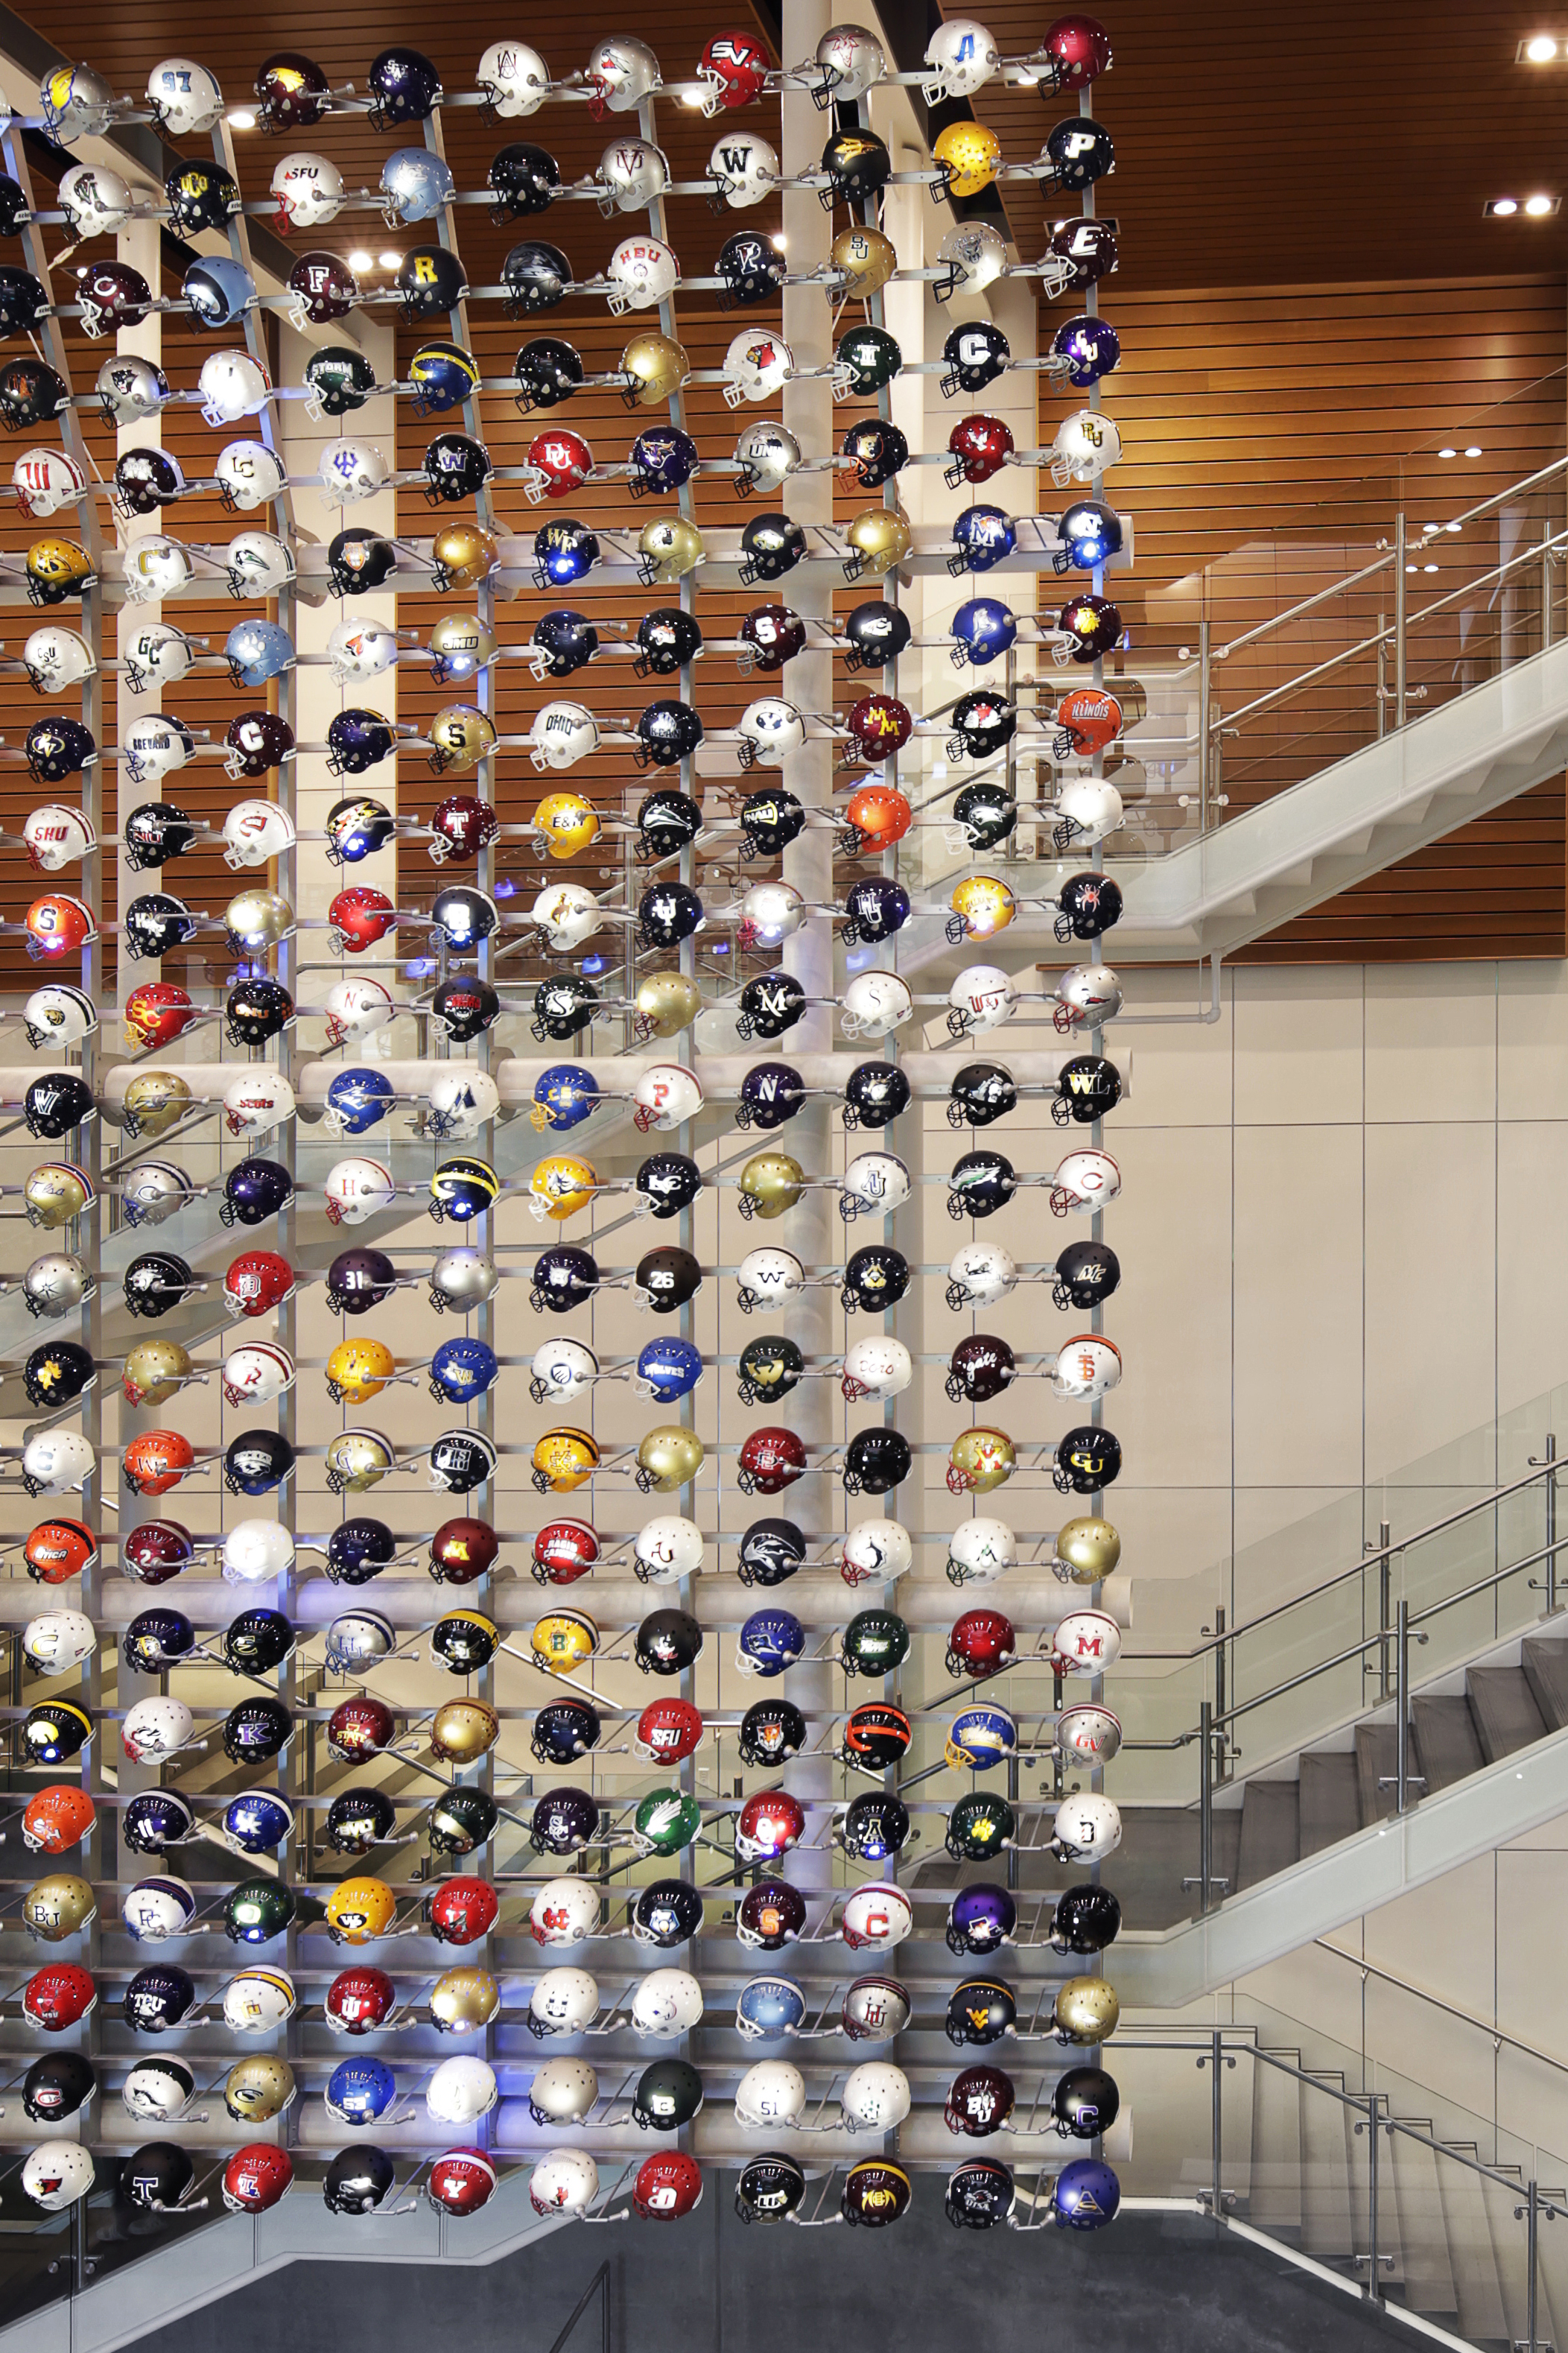 College Football Hall of Fame, Atlanta, GA